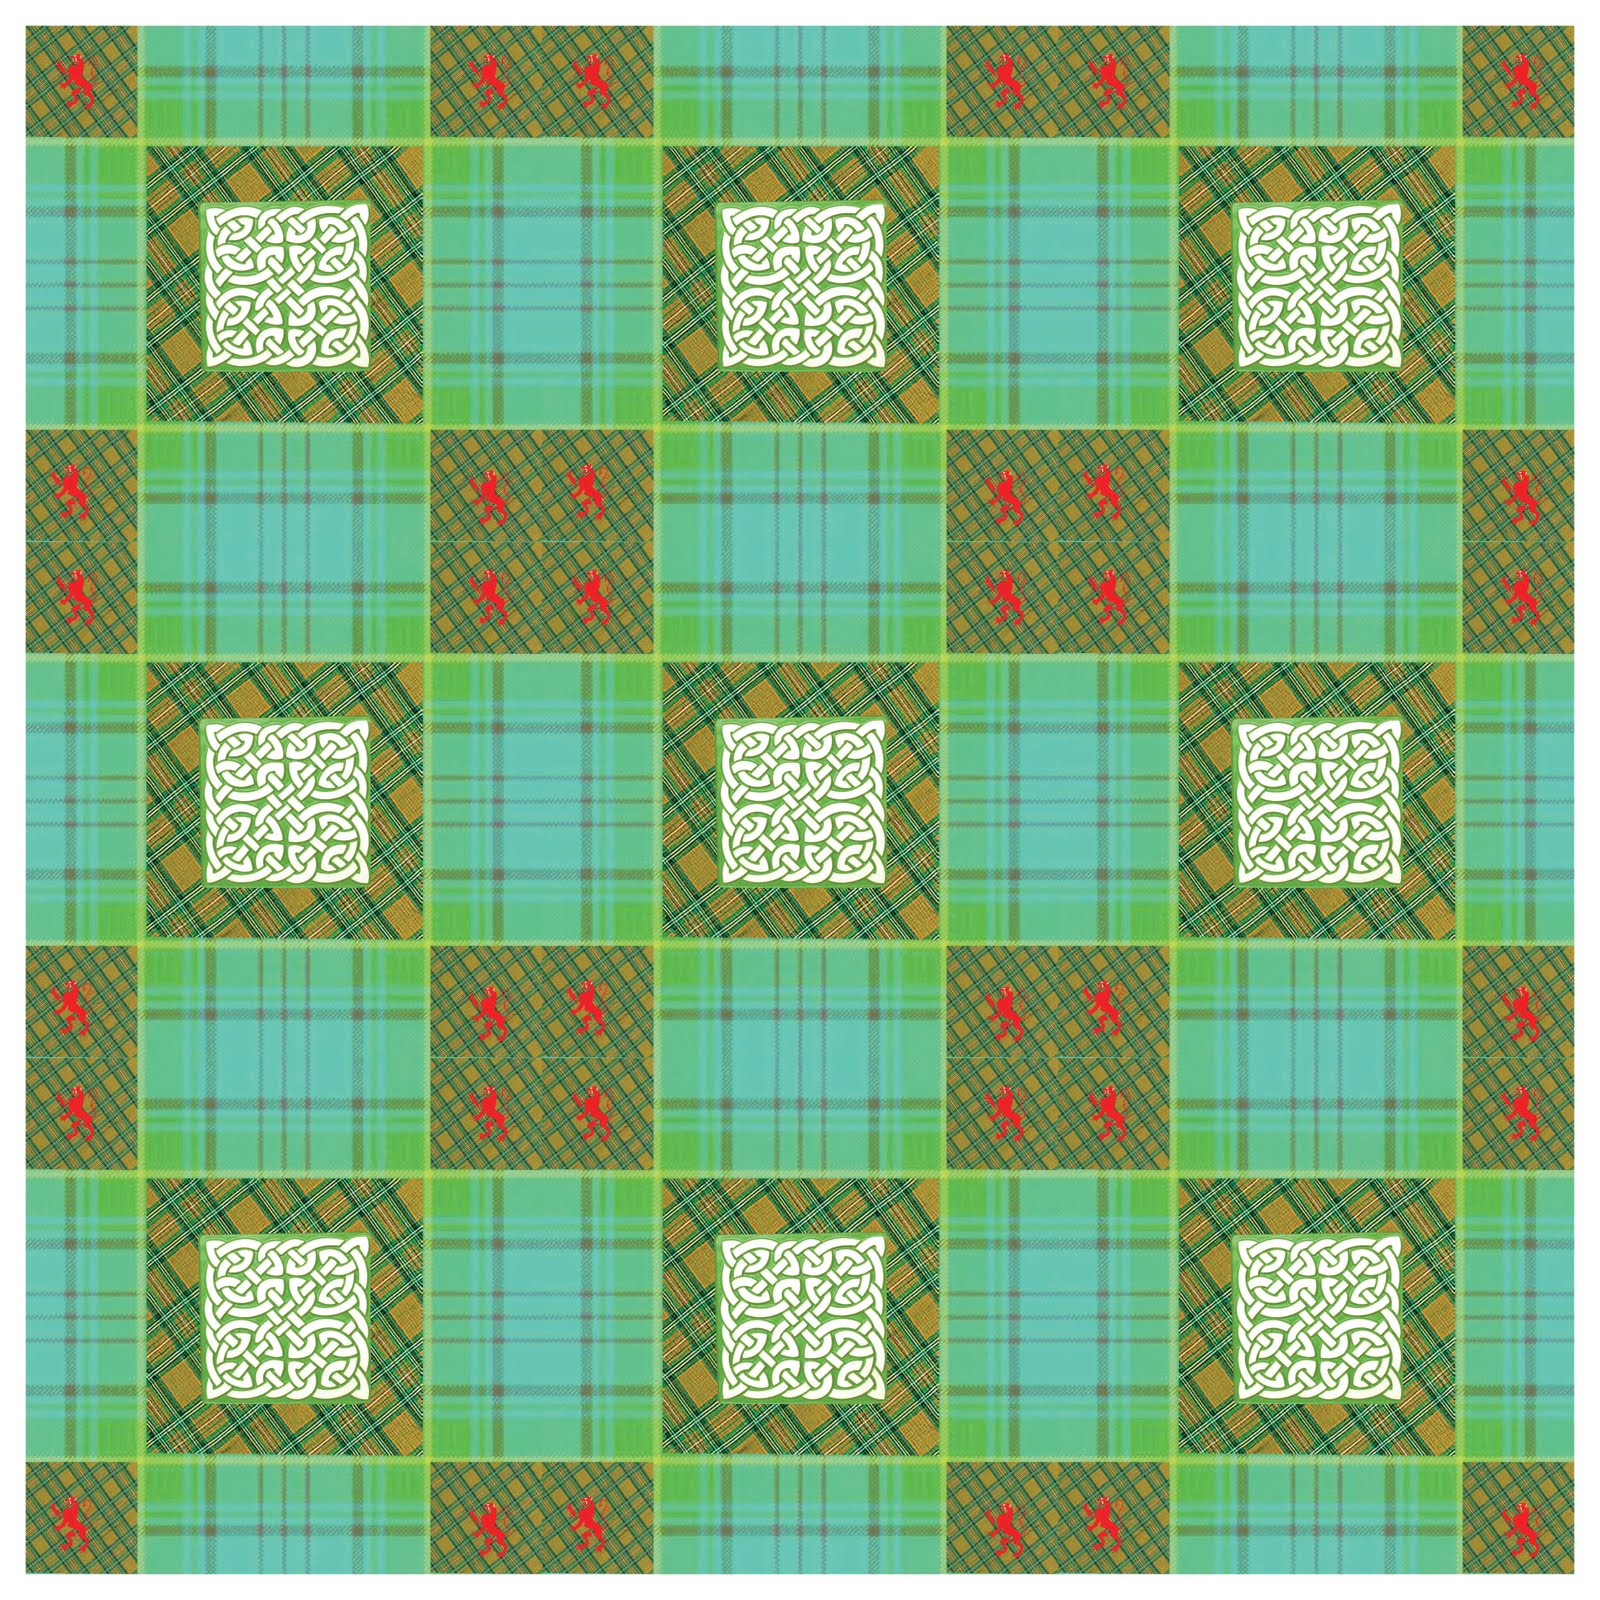 Irish Plaid Quilt Block Pattern